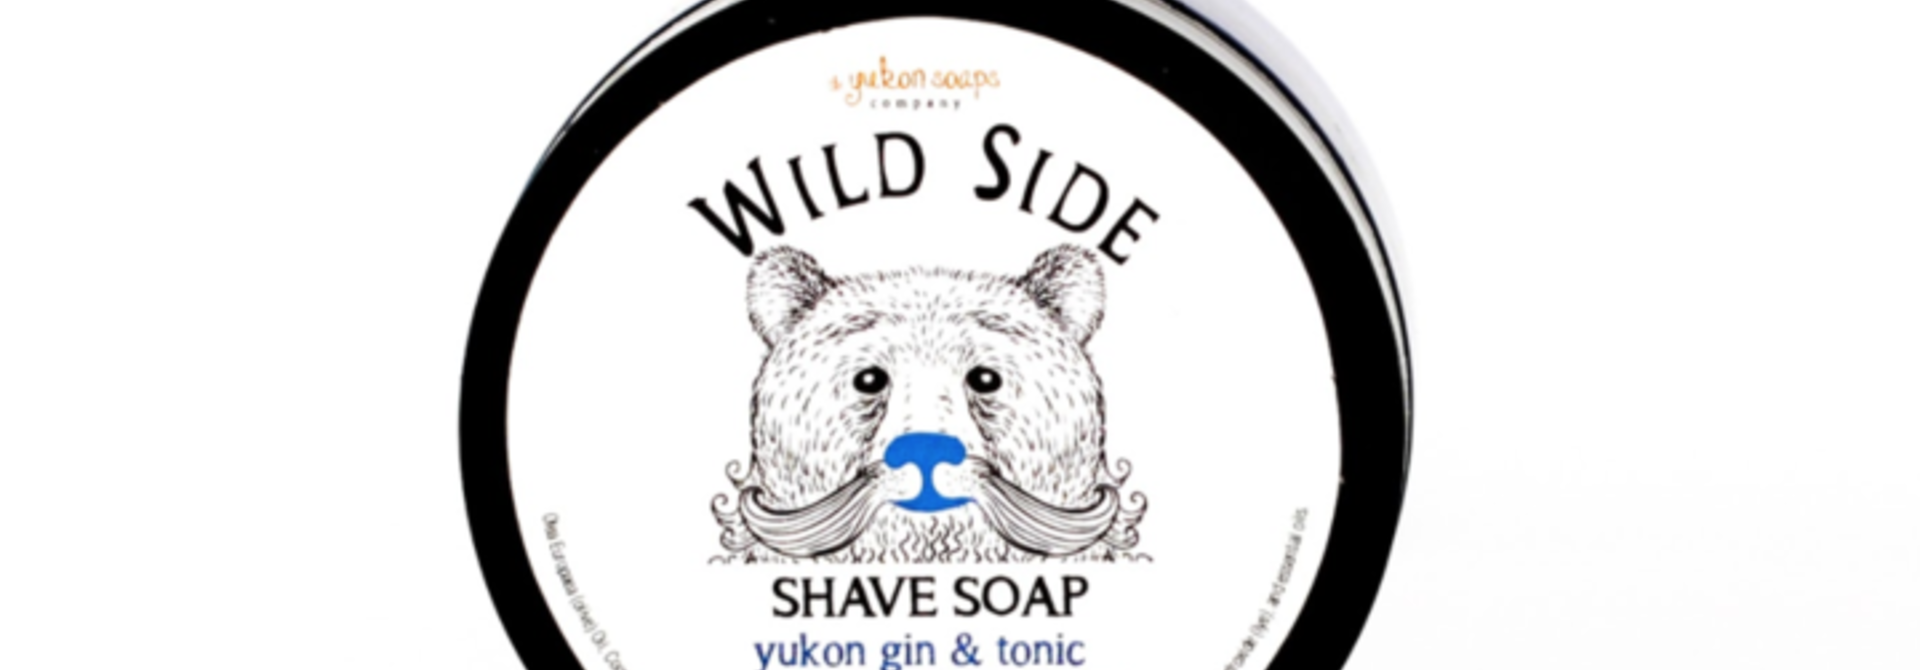 Shave Soap - Black pepper lime